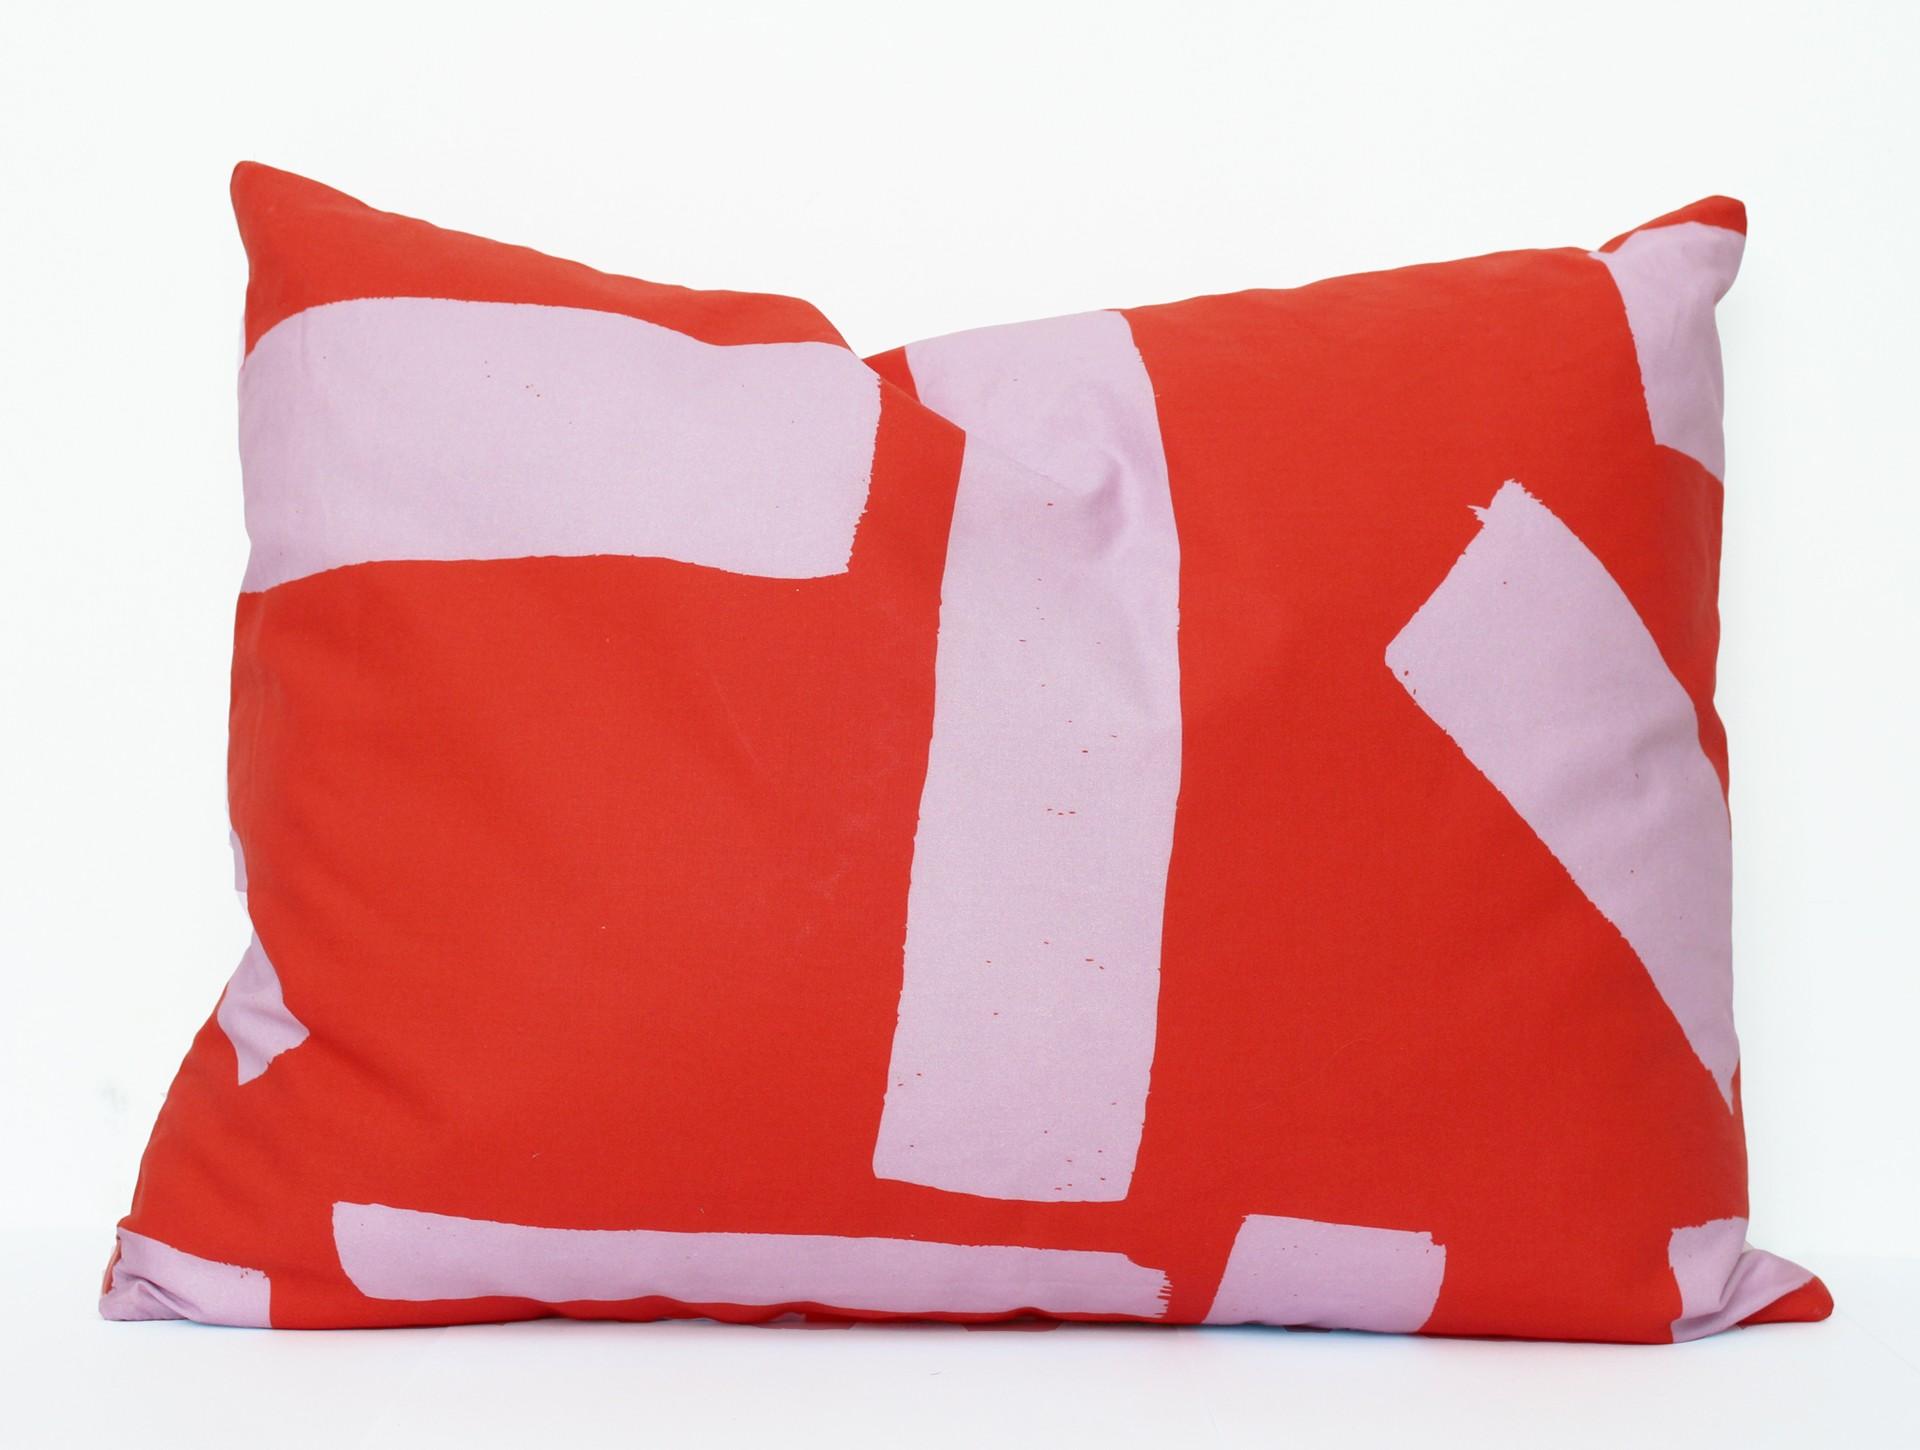 Duvetcover pillowcase: red | lilac